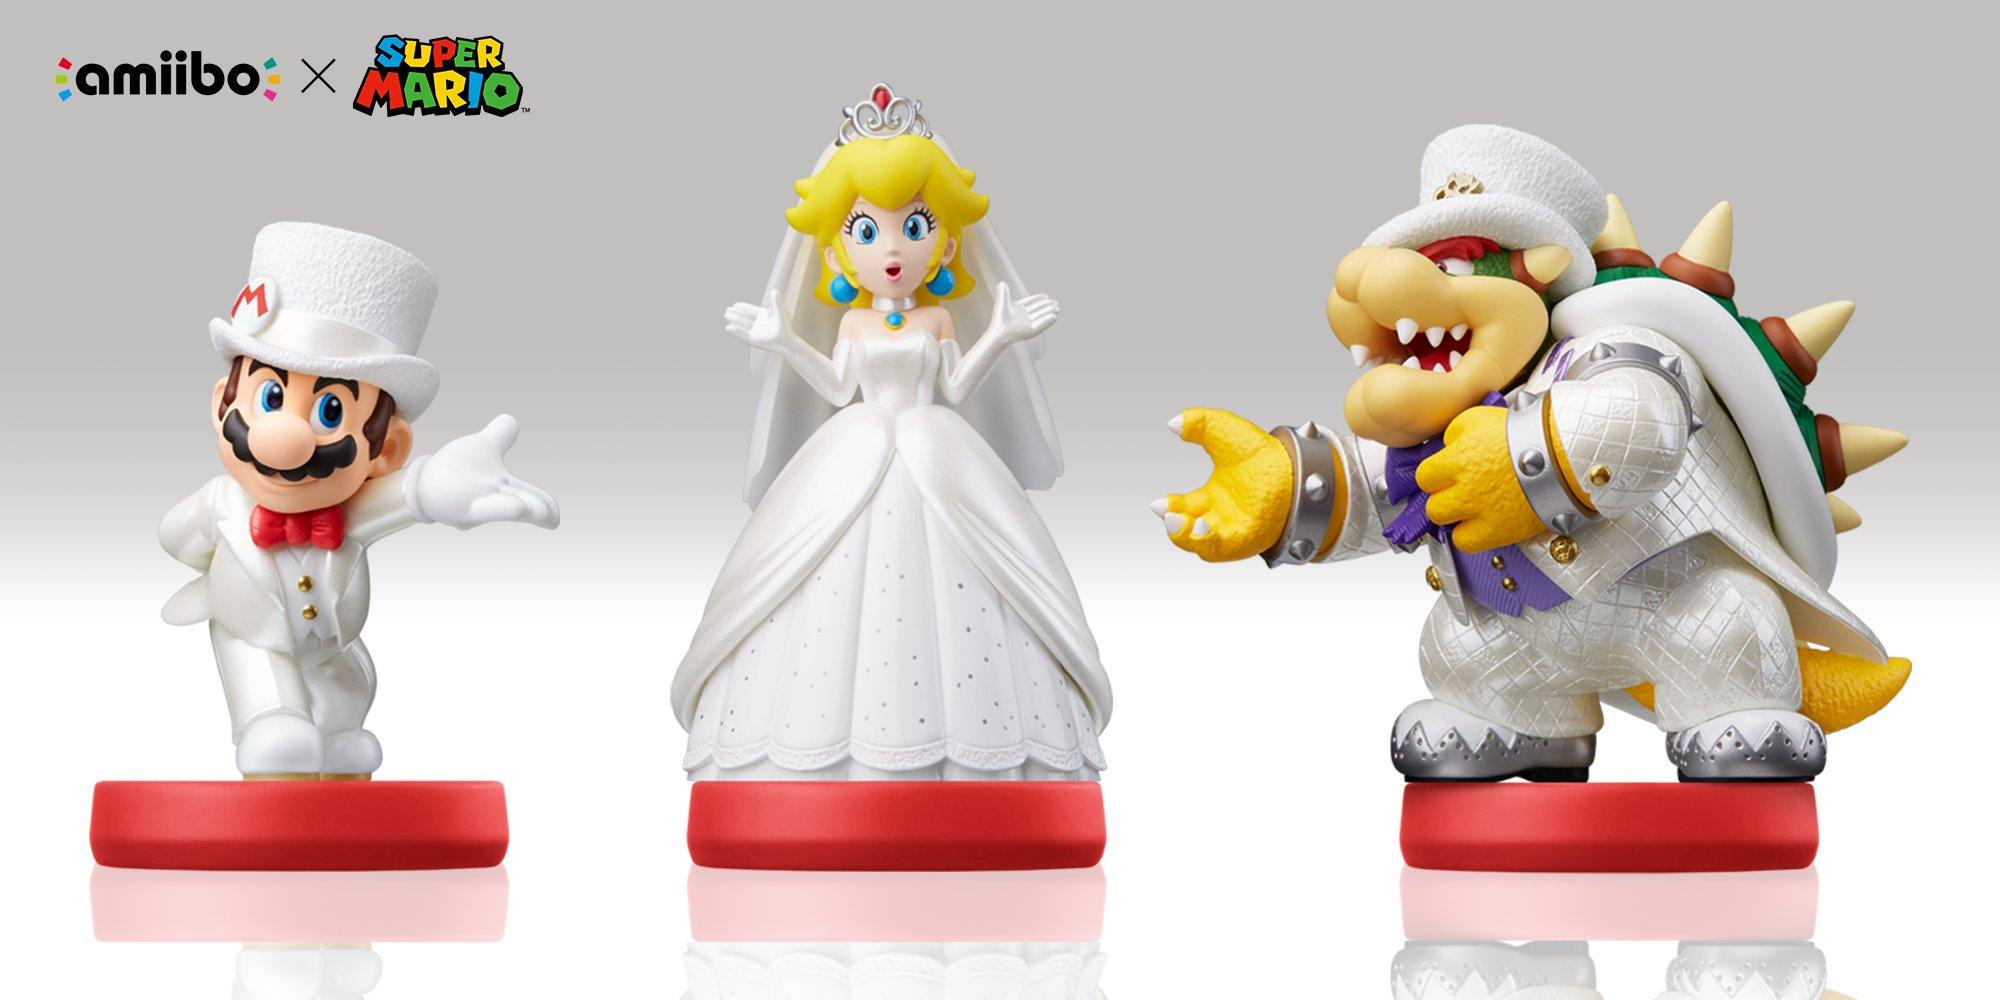 Super Mario Odyssey and Mario & Luigi Superstar Saga Will